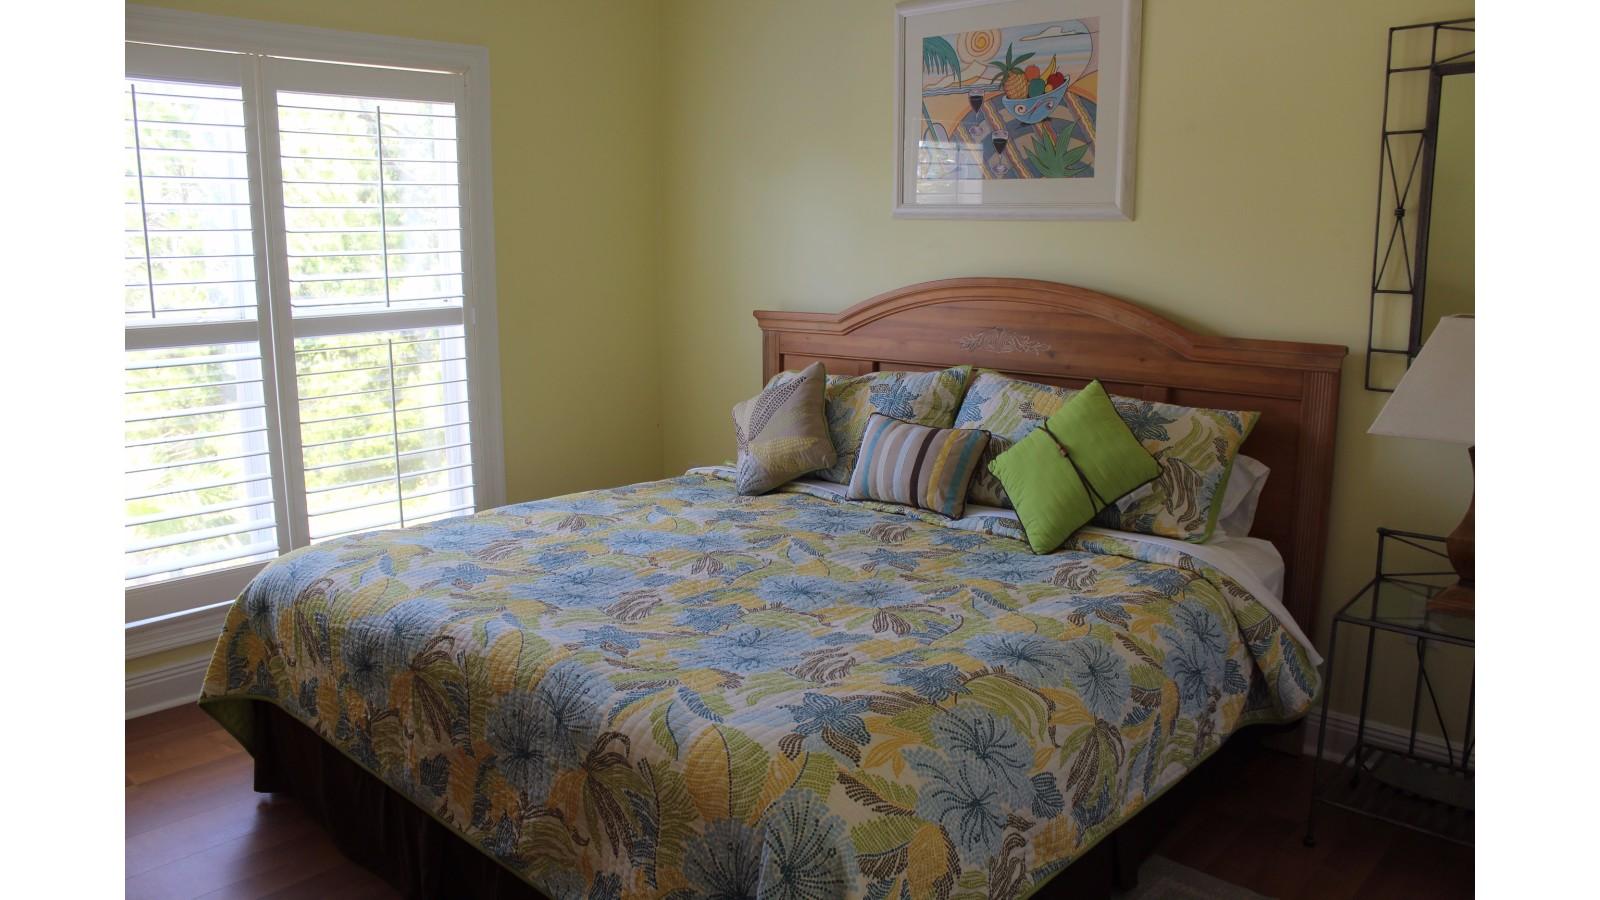 Yellow Bedroom, King Mattress, Main Floor, Bathroom Attached, Facing North/Road, TV and Closet